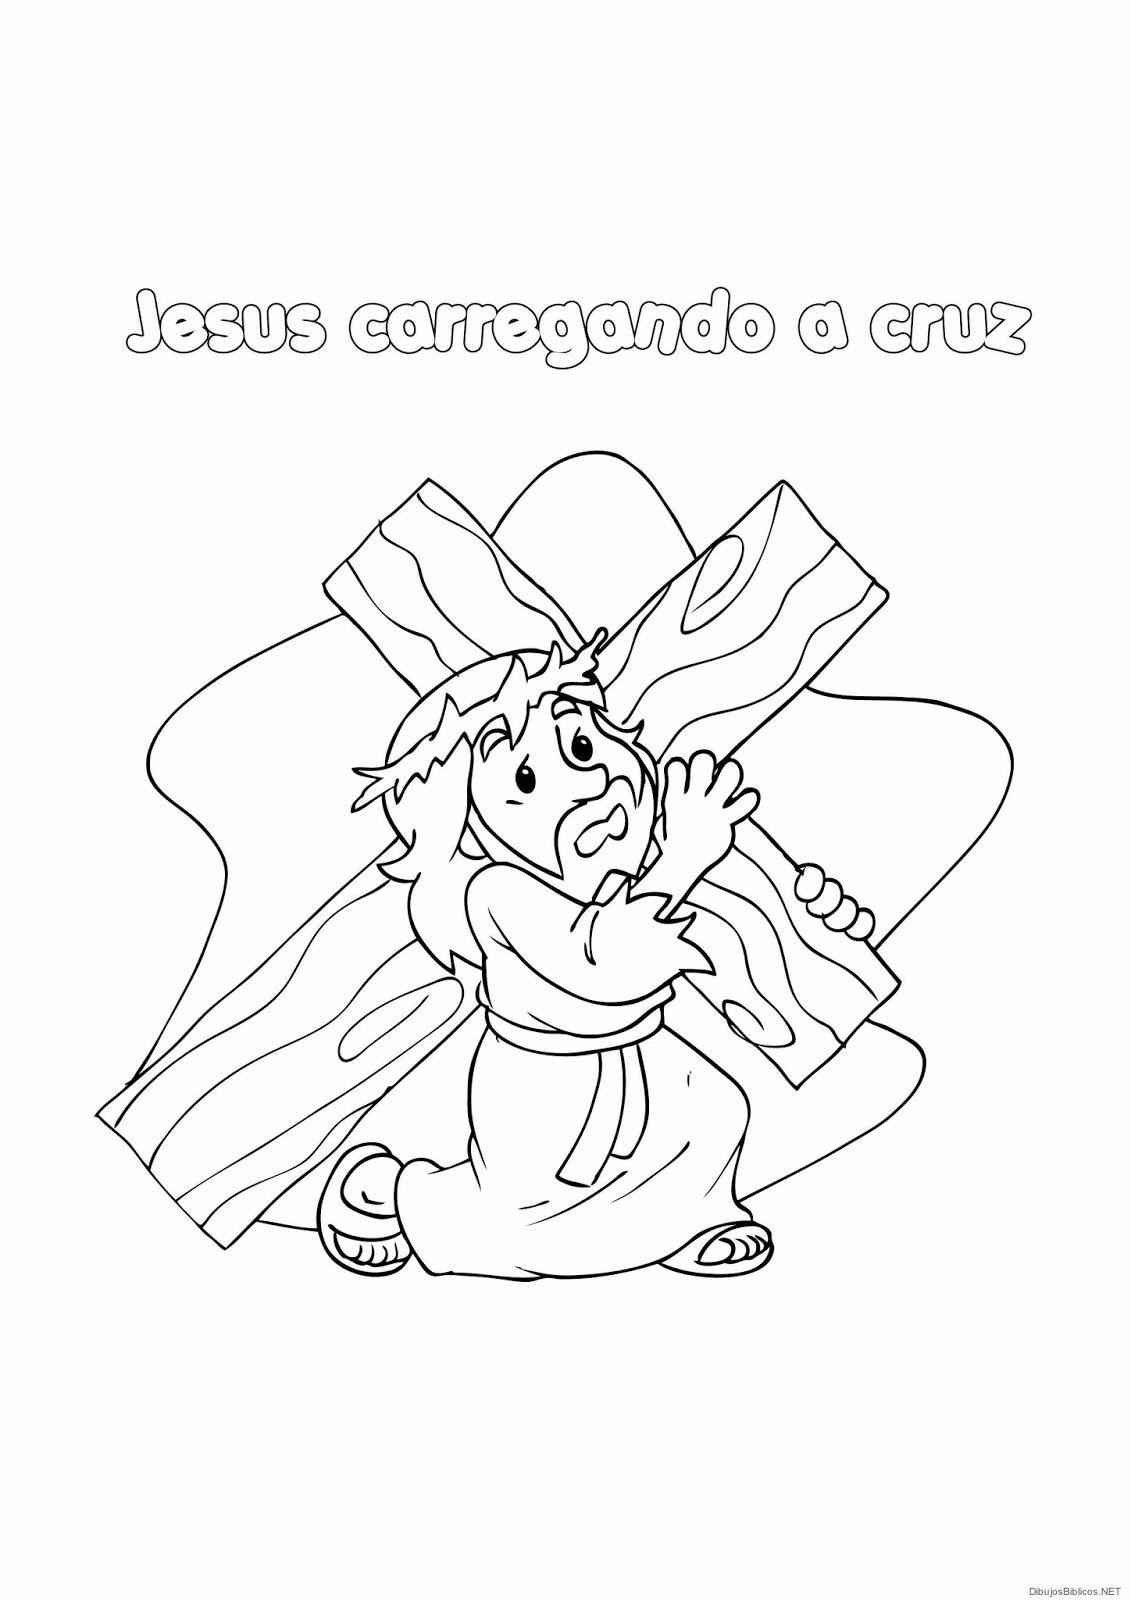 Jesus Carga La Cruz - Dibujos de la biblia | Angeles para colorear ...